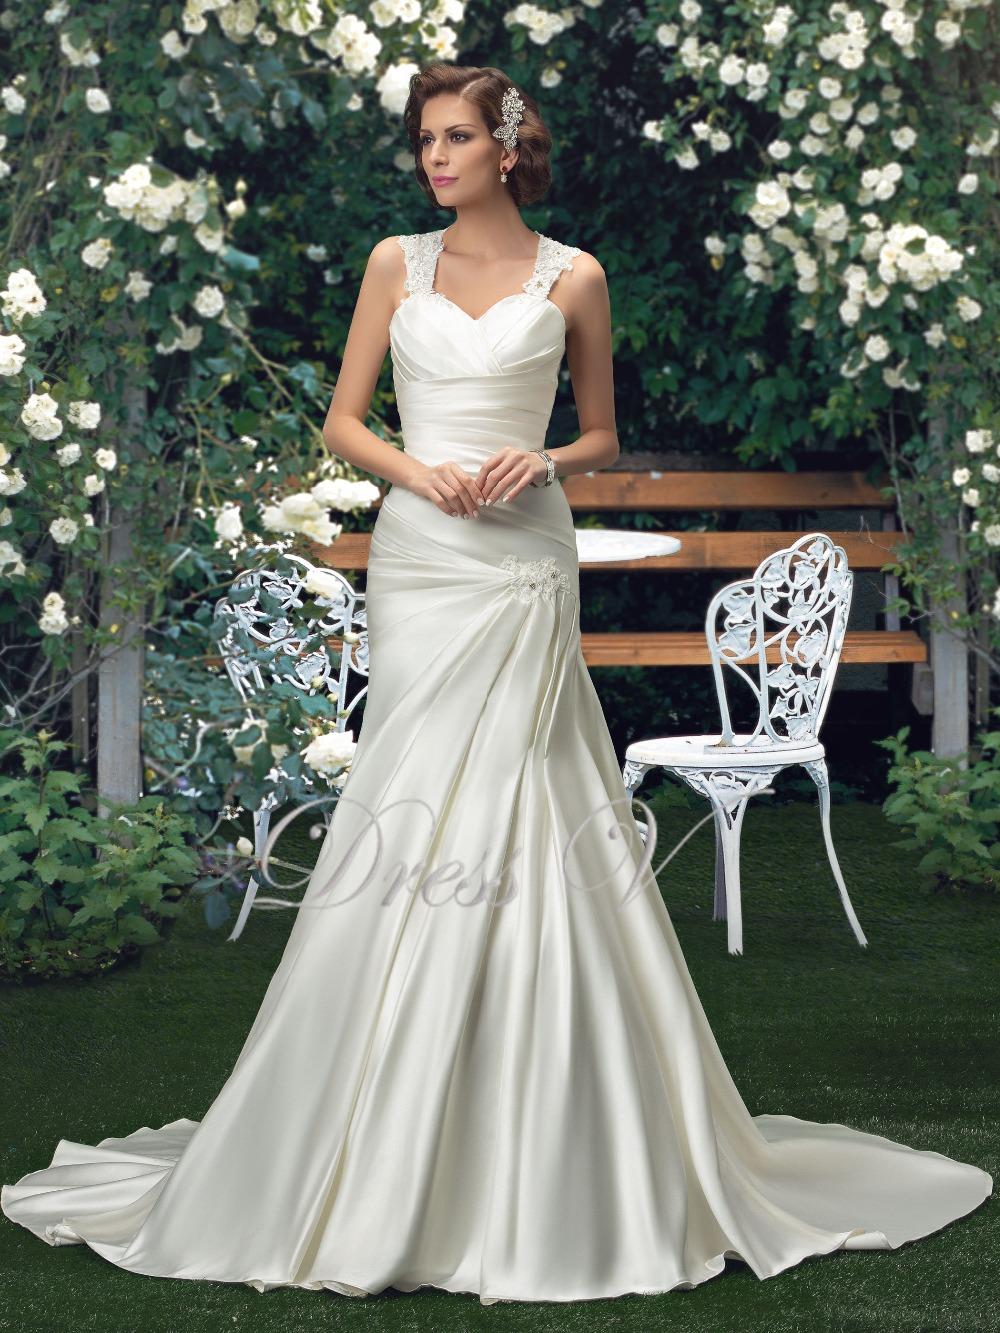 Plus size wedding dresses 2016 beaded straps sweetheart for Plus size wedding dresses with straps